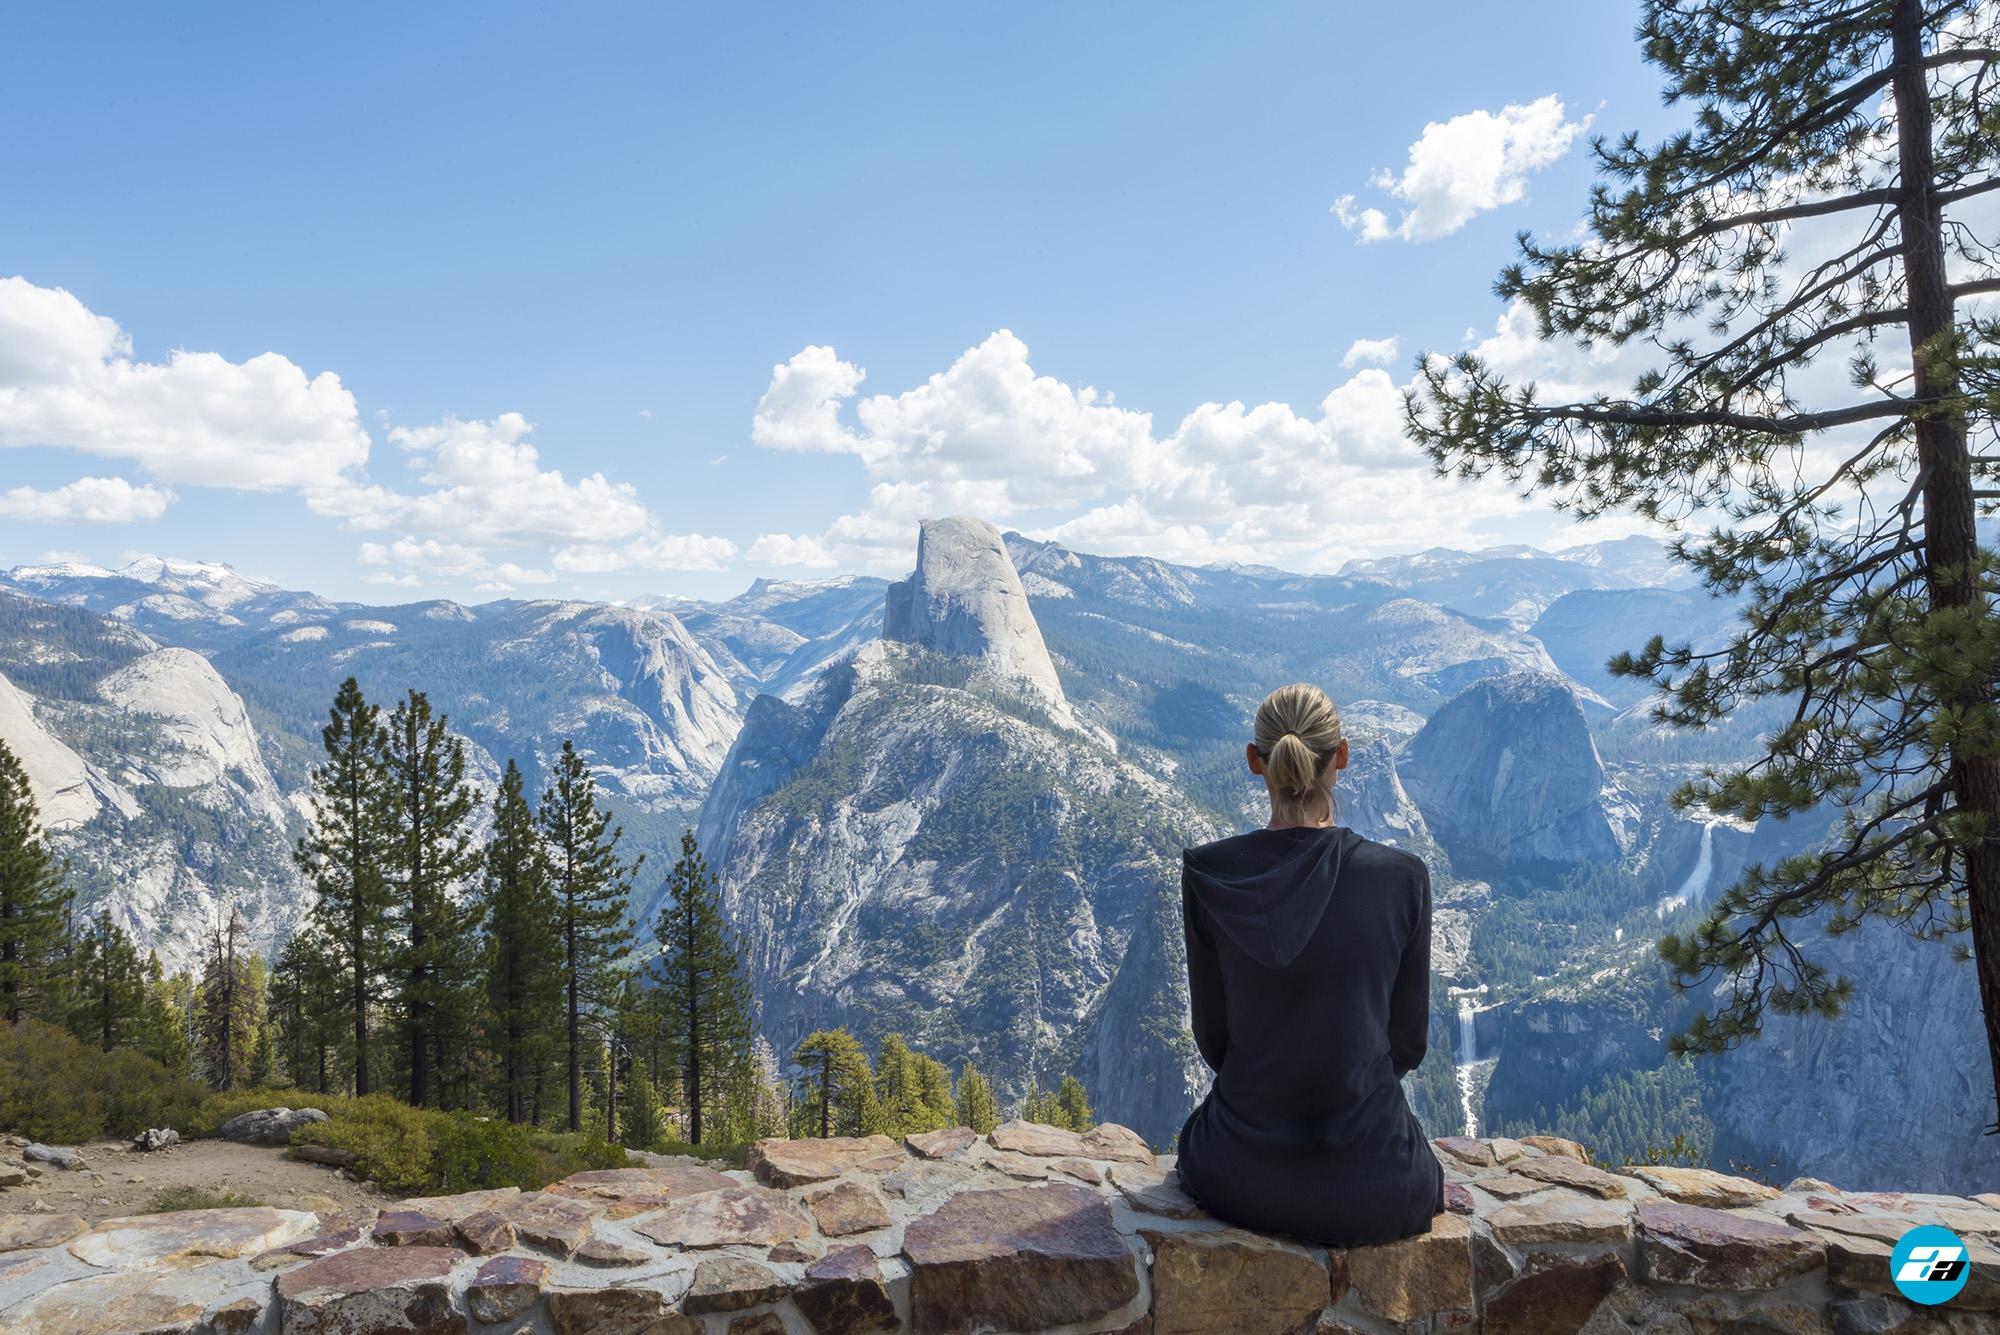 Yosemite National Park, California, USA. Landscape. Solitude. Mountain View. Glacier Point